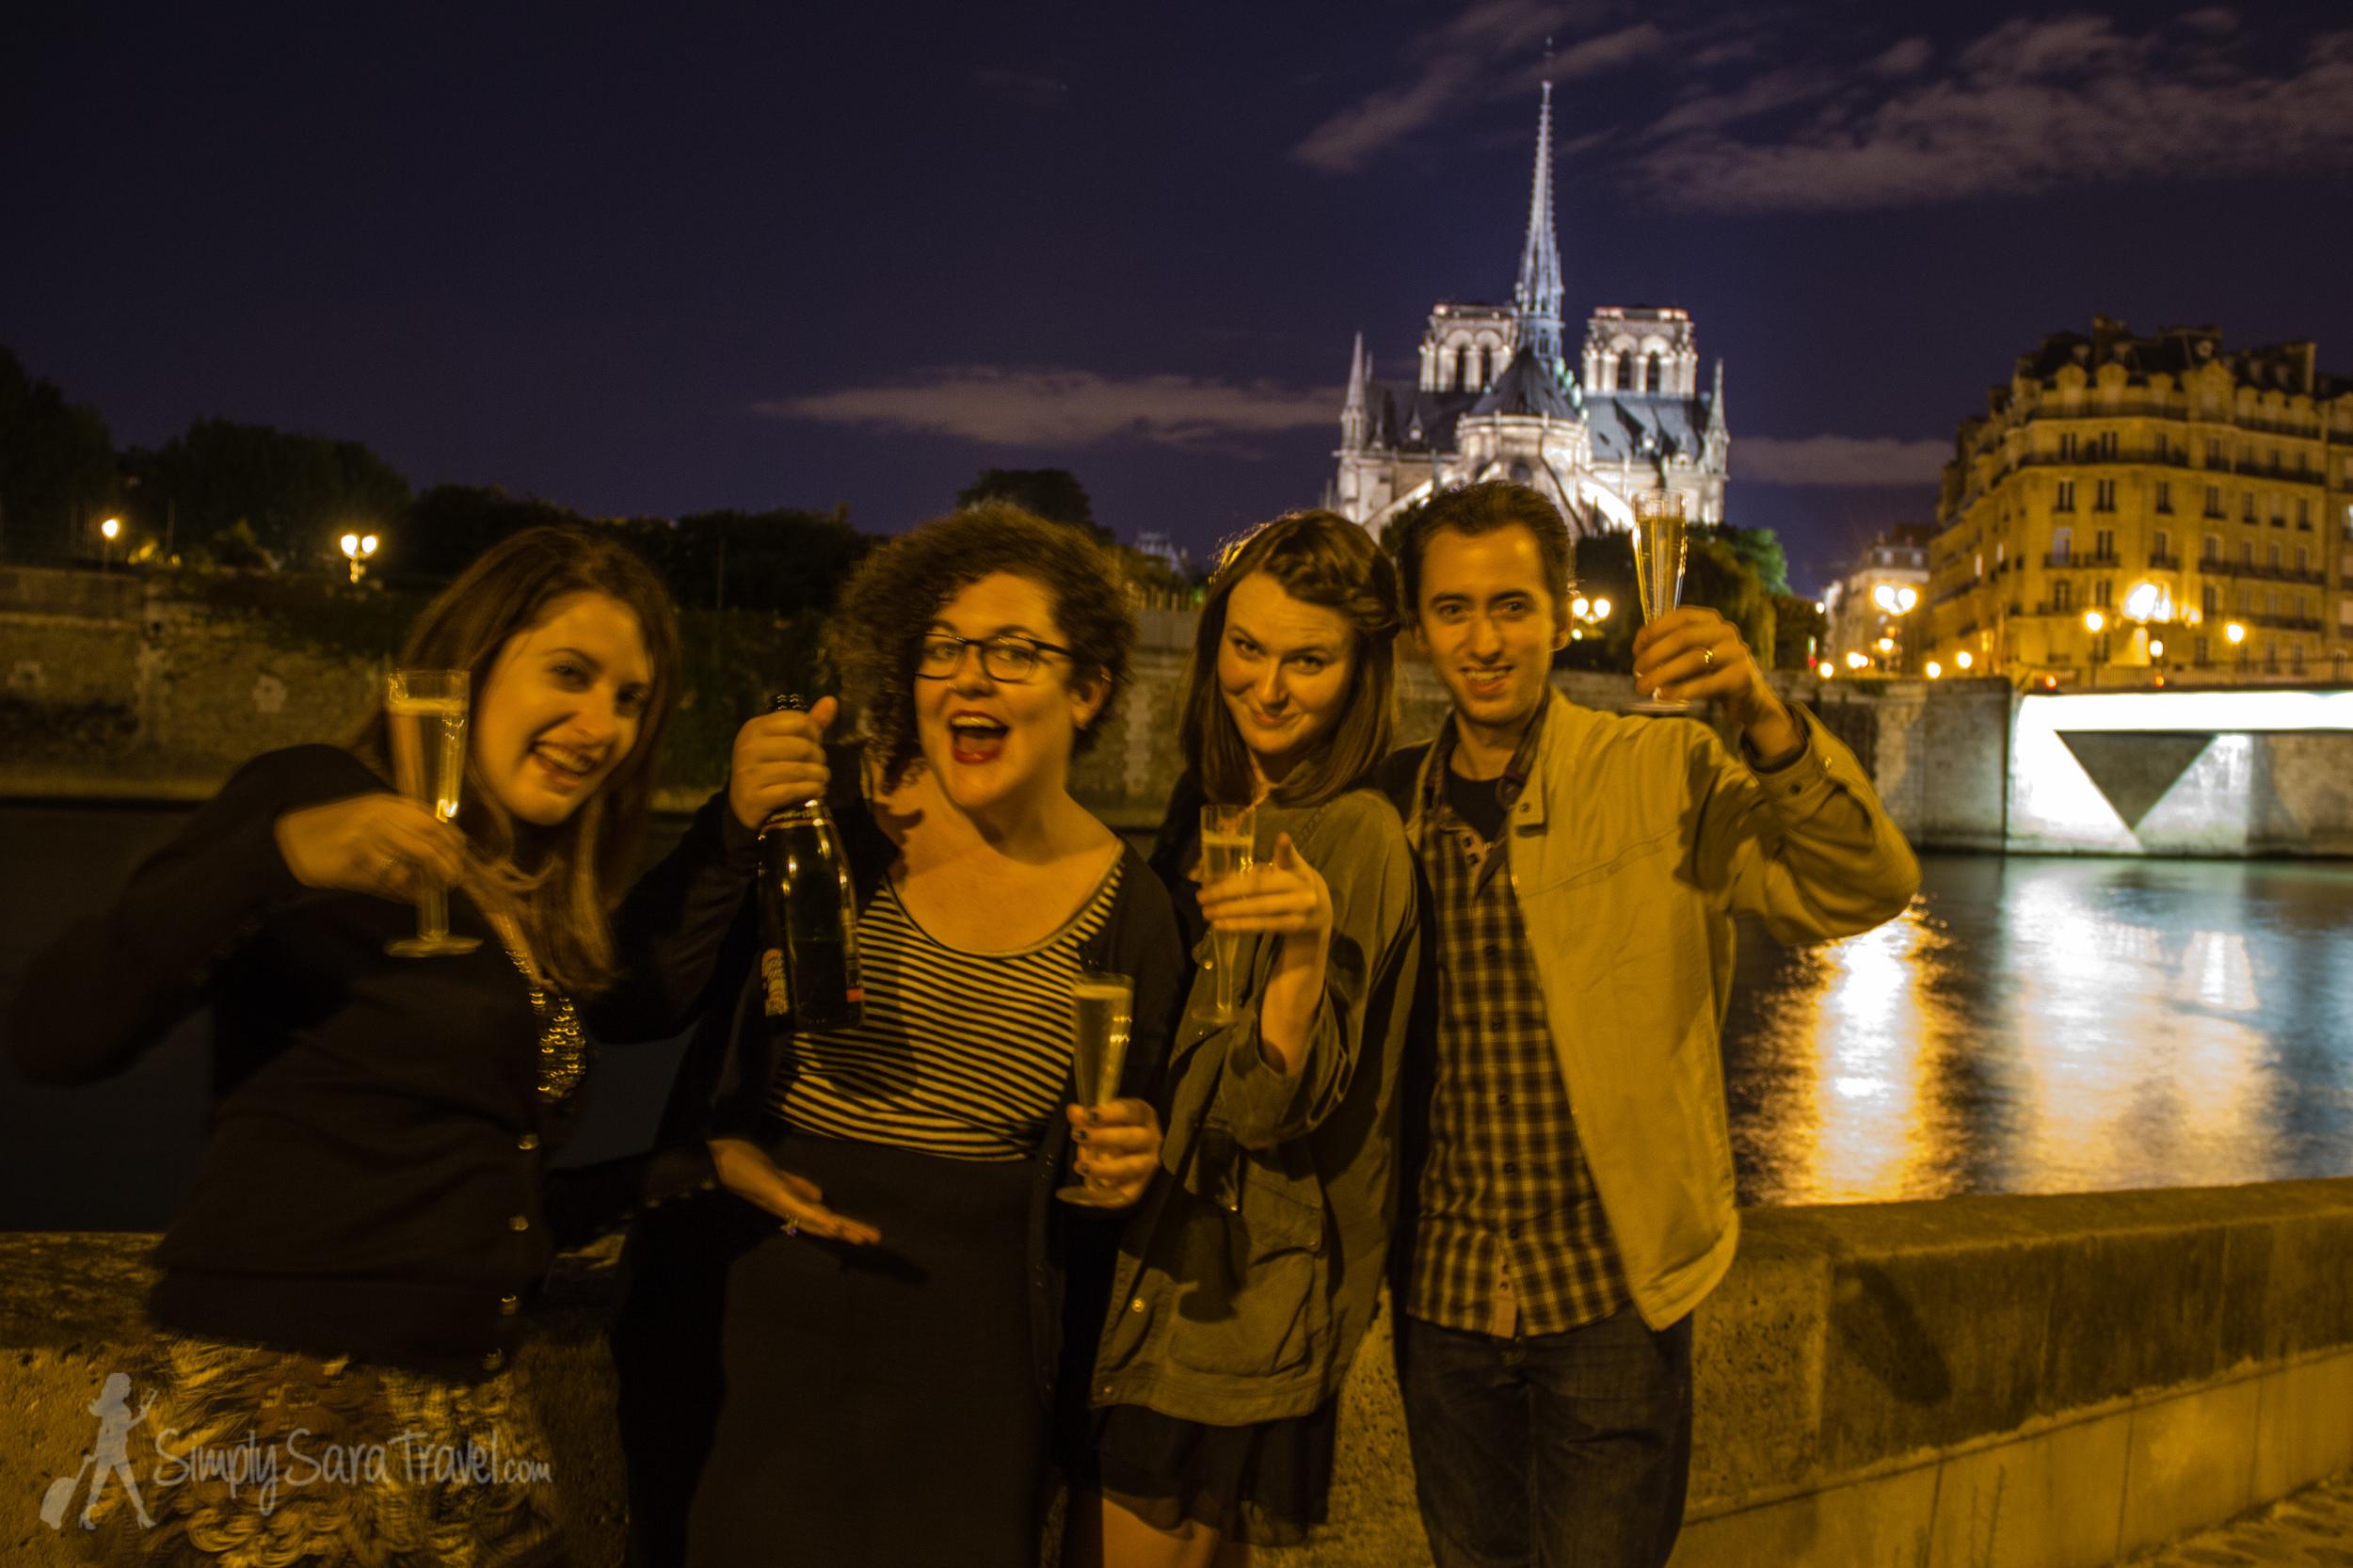 Cheers to friendship at our picnic spot onÎle Saint-Louis